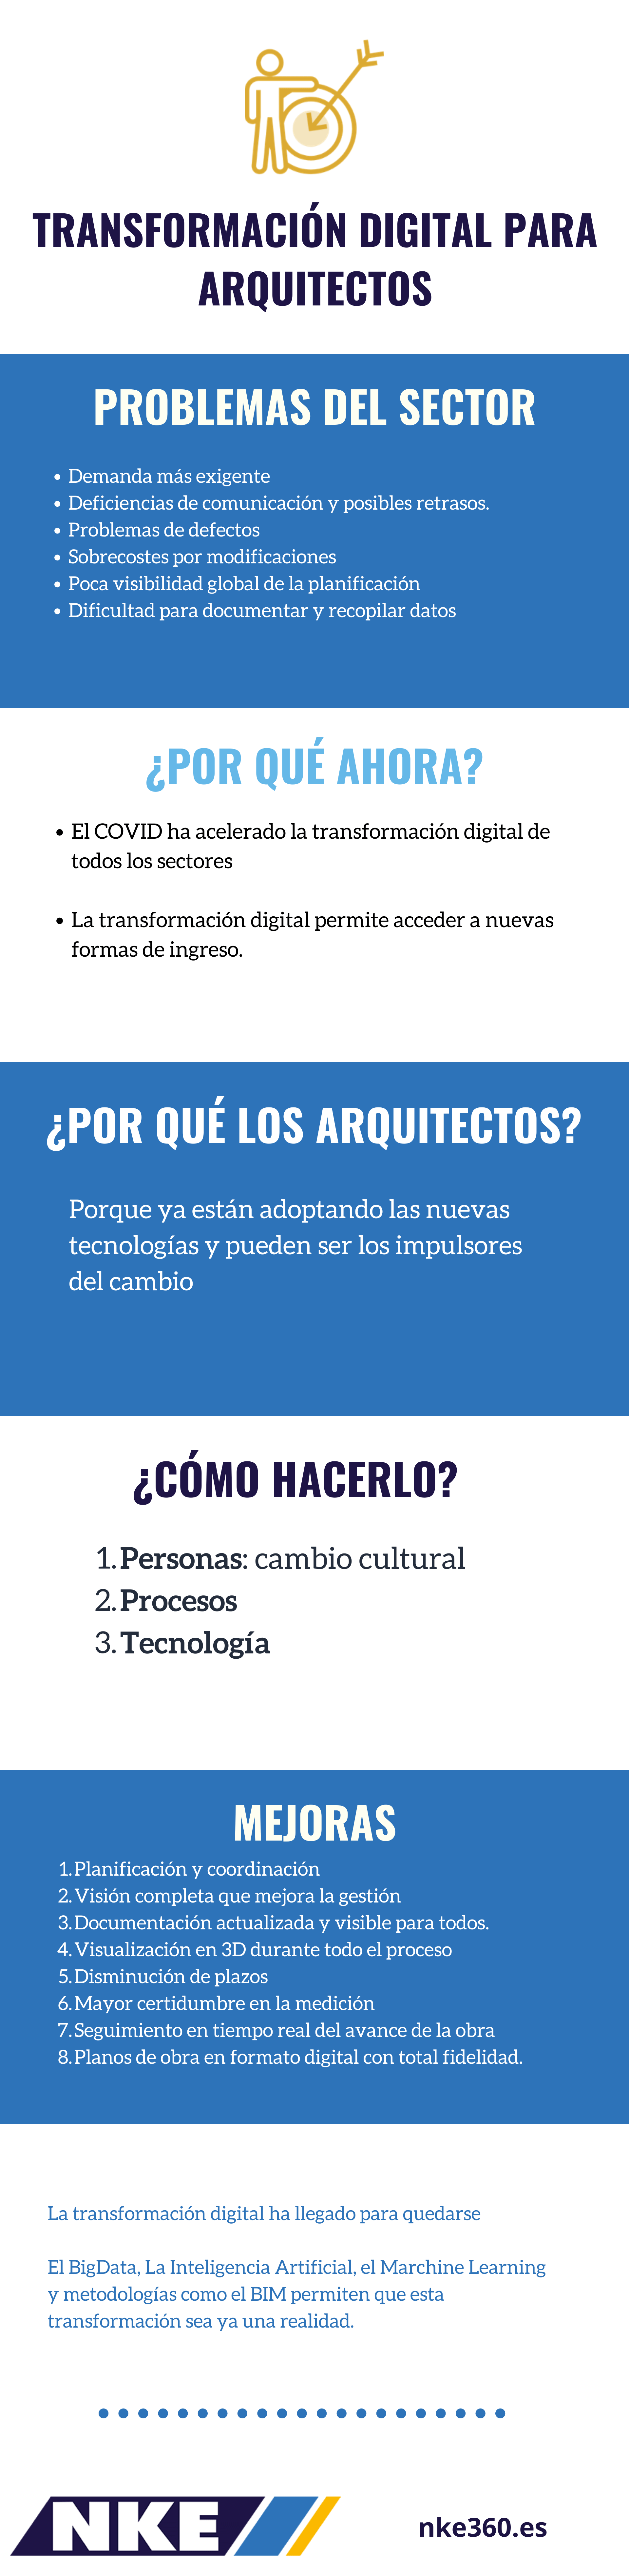 nke-transformacion-digital-arquitecto